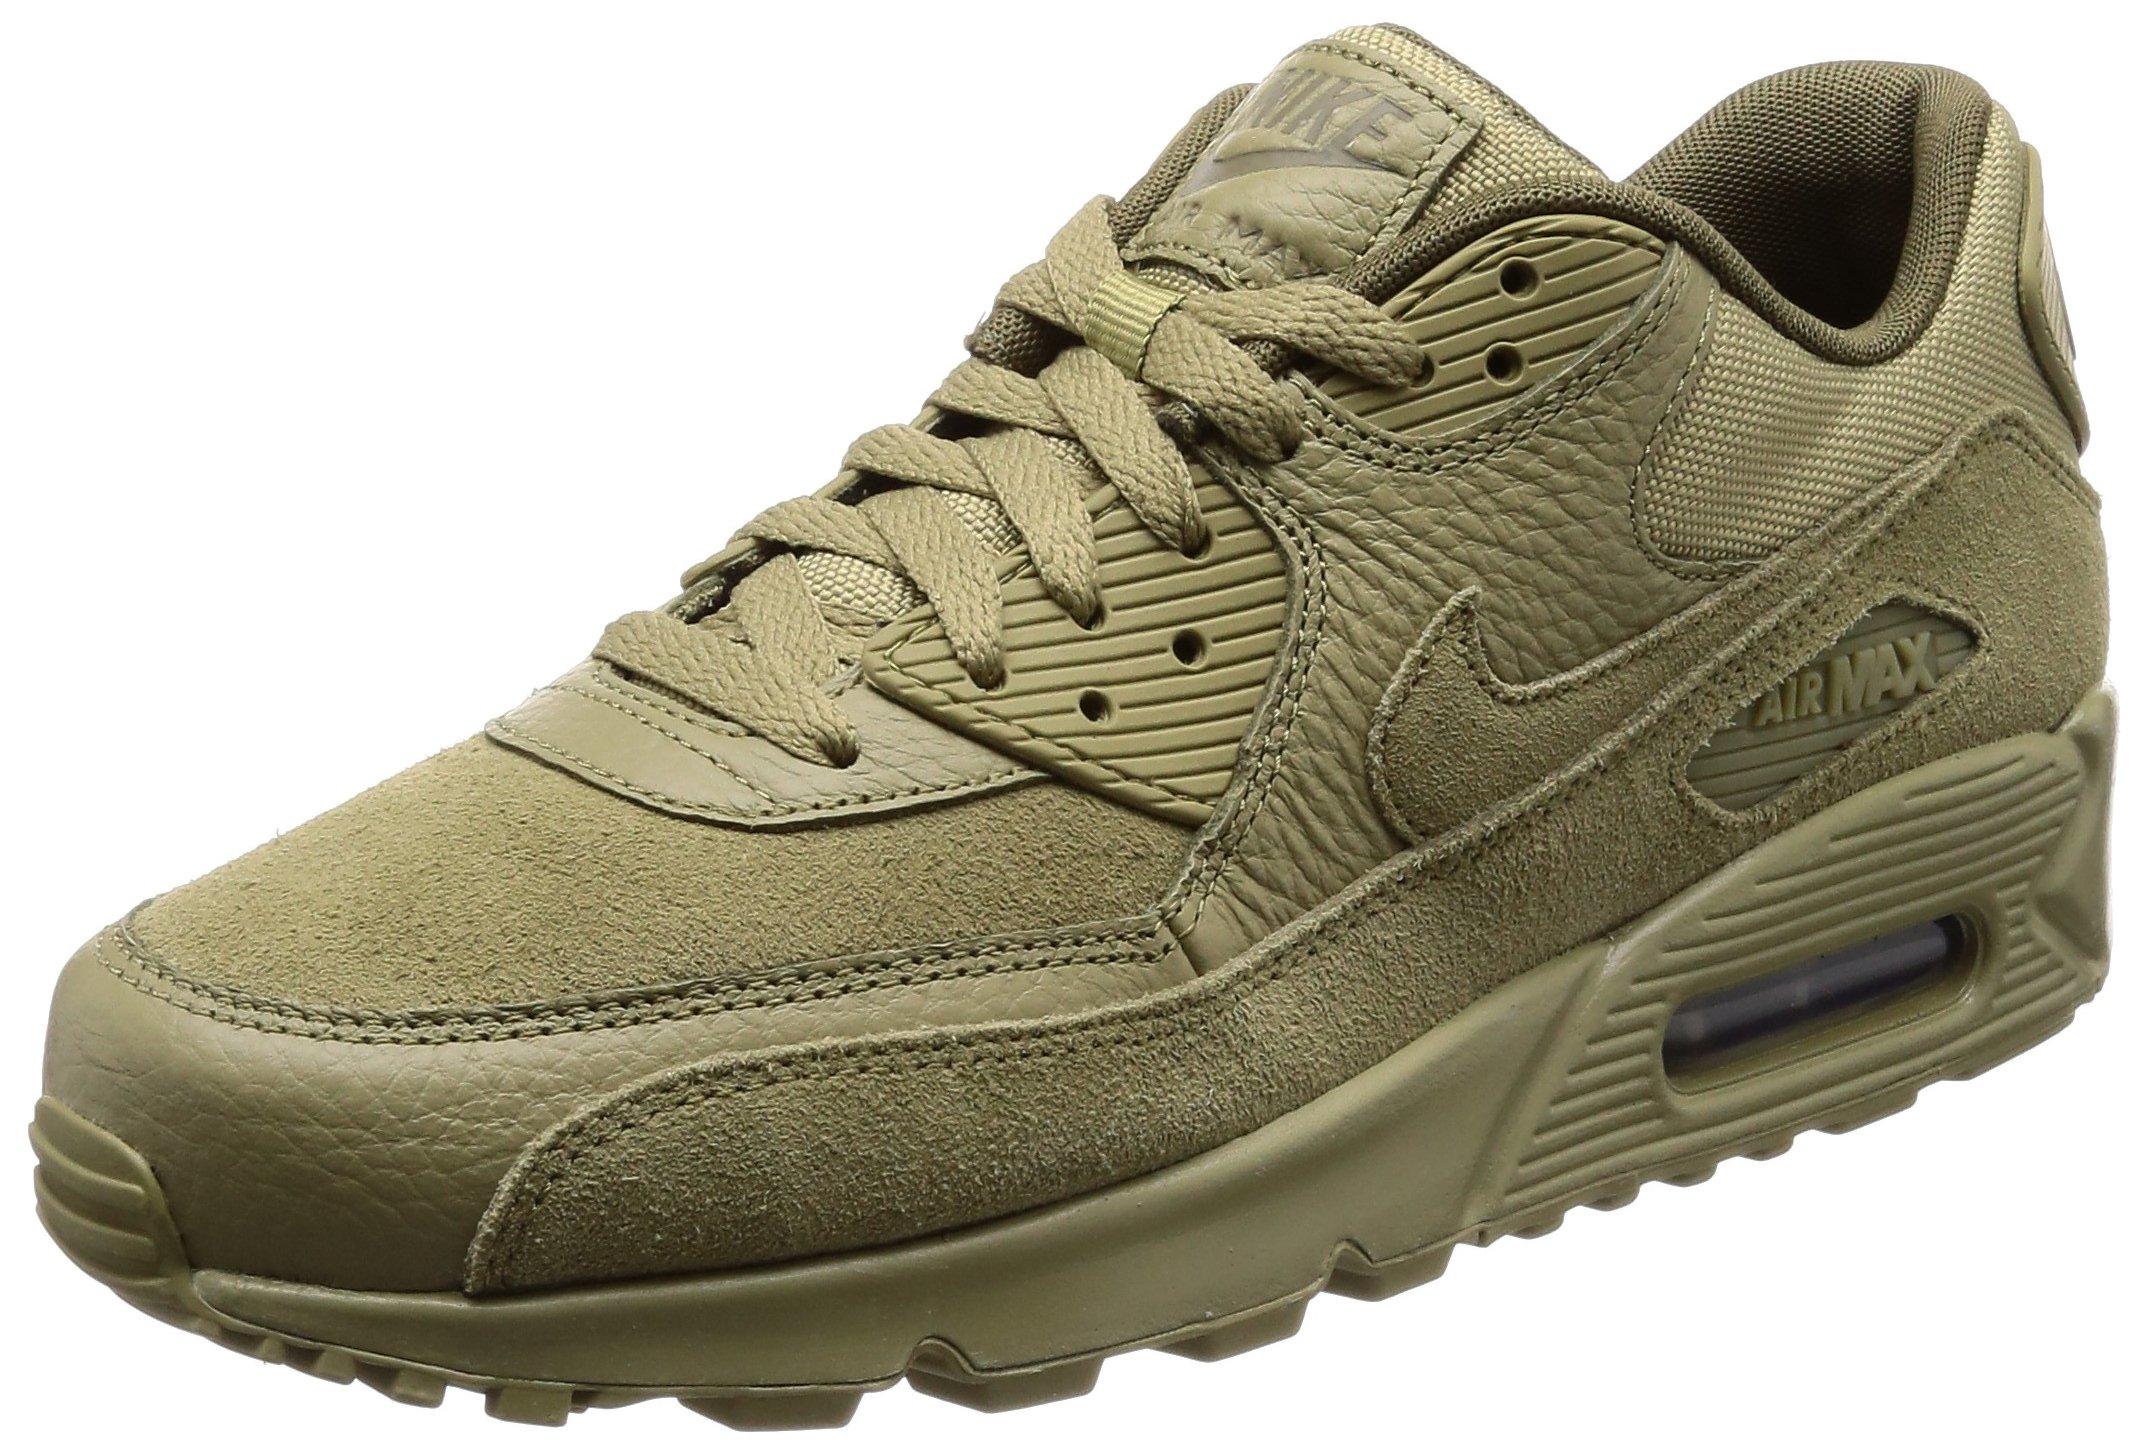 pretty nice 657d6 944f2 Galleon - Nike Men s Air Max 90 Premium Neutral Olive 700155-202 (Size  9.5)